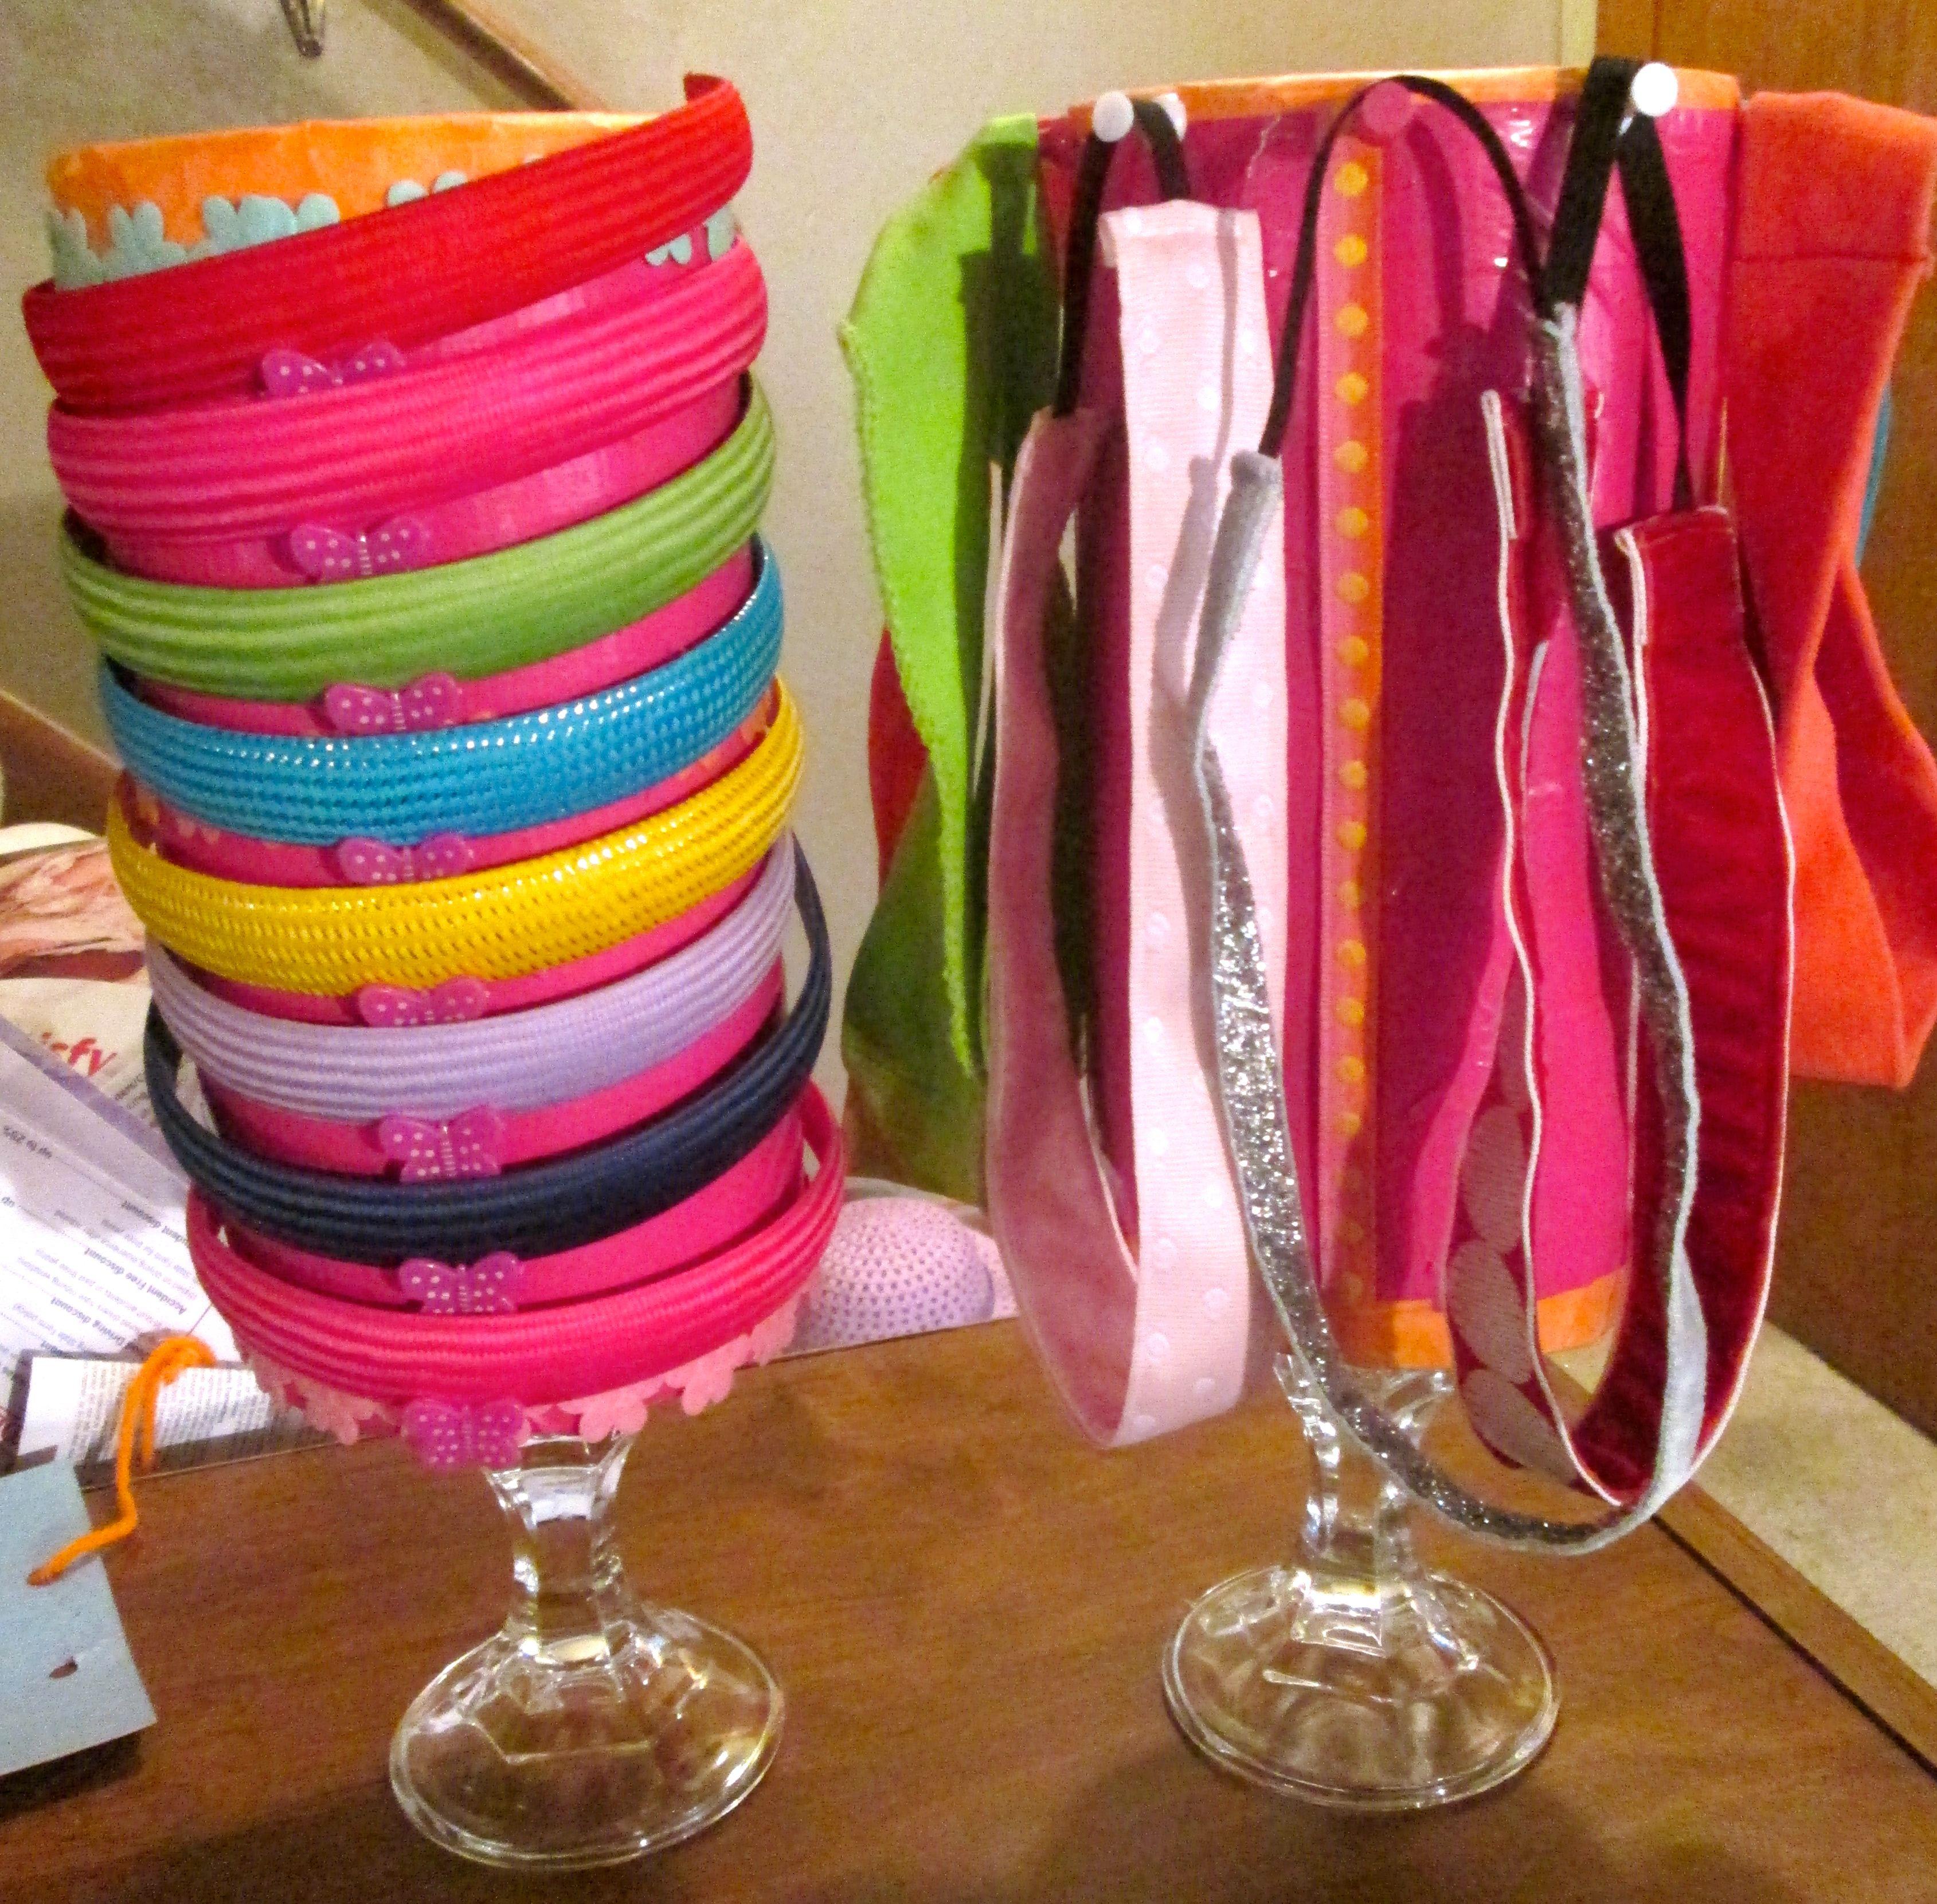 Handmade headband holders. Made of recycled Clorox Wipes